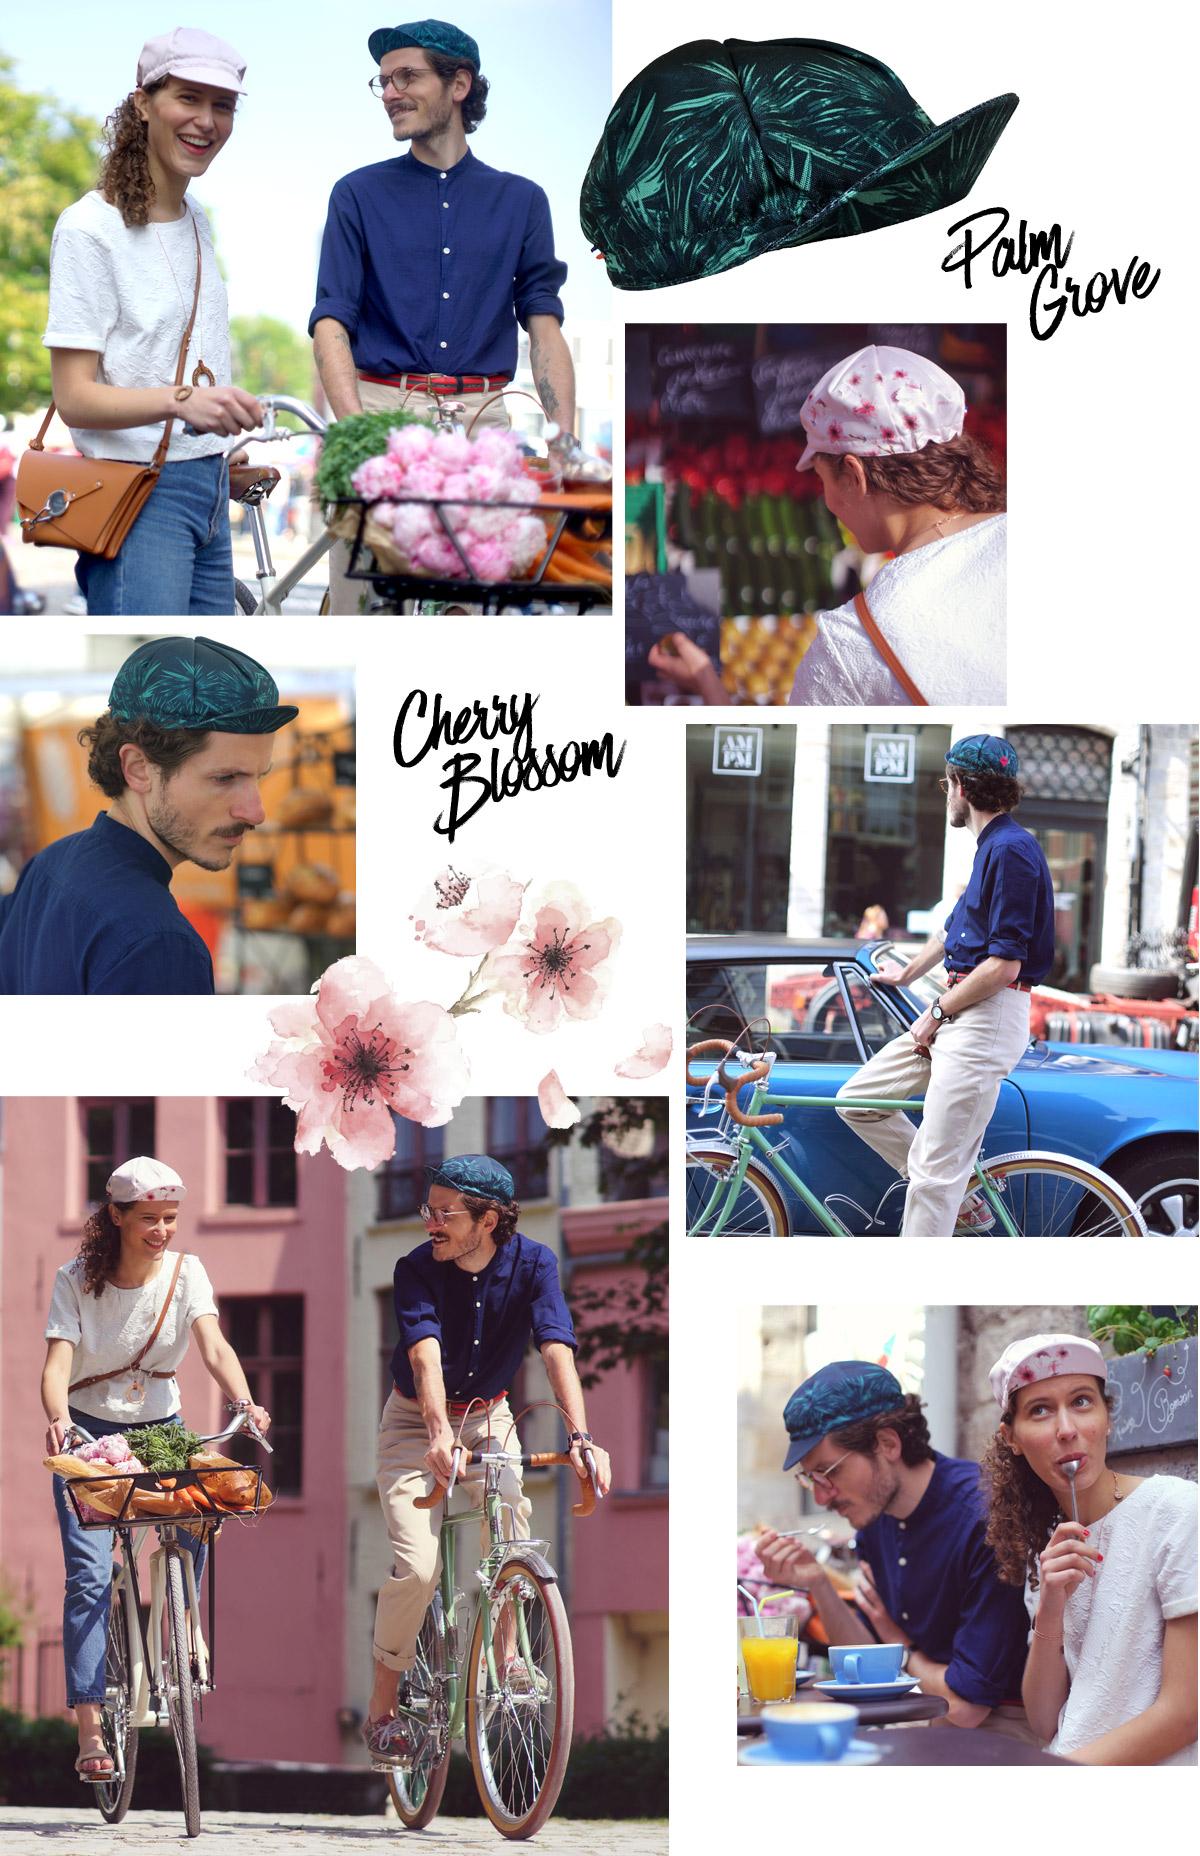 lookbook2018-vera-cycling-casquettes-velo-palmgrove